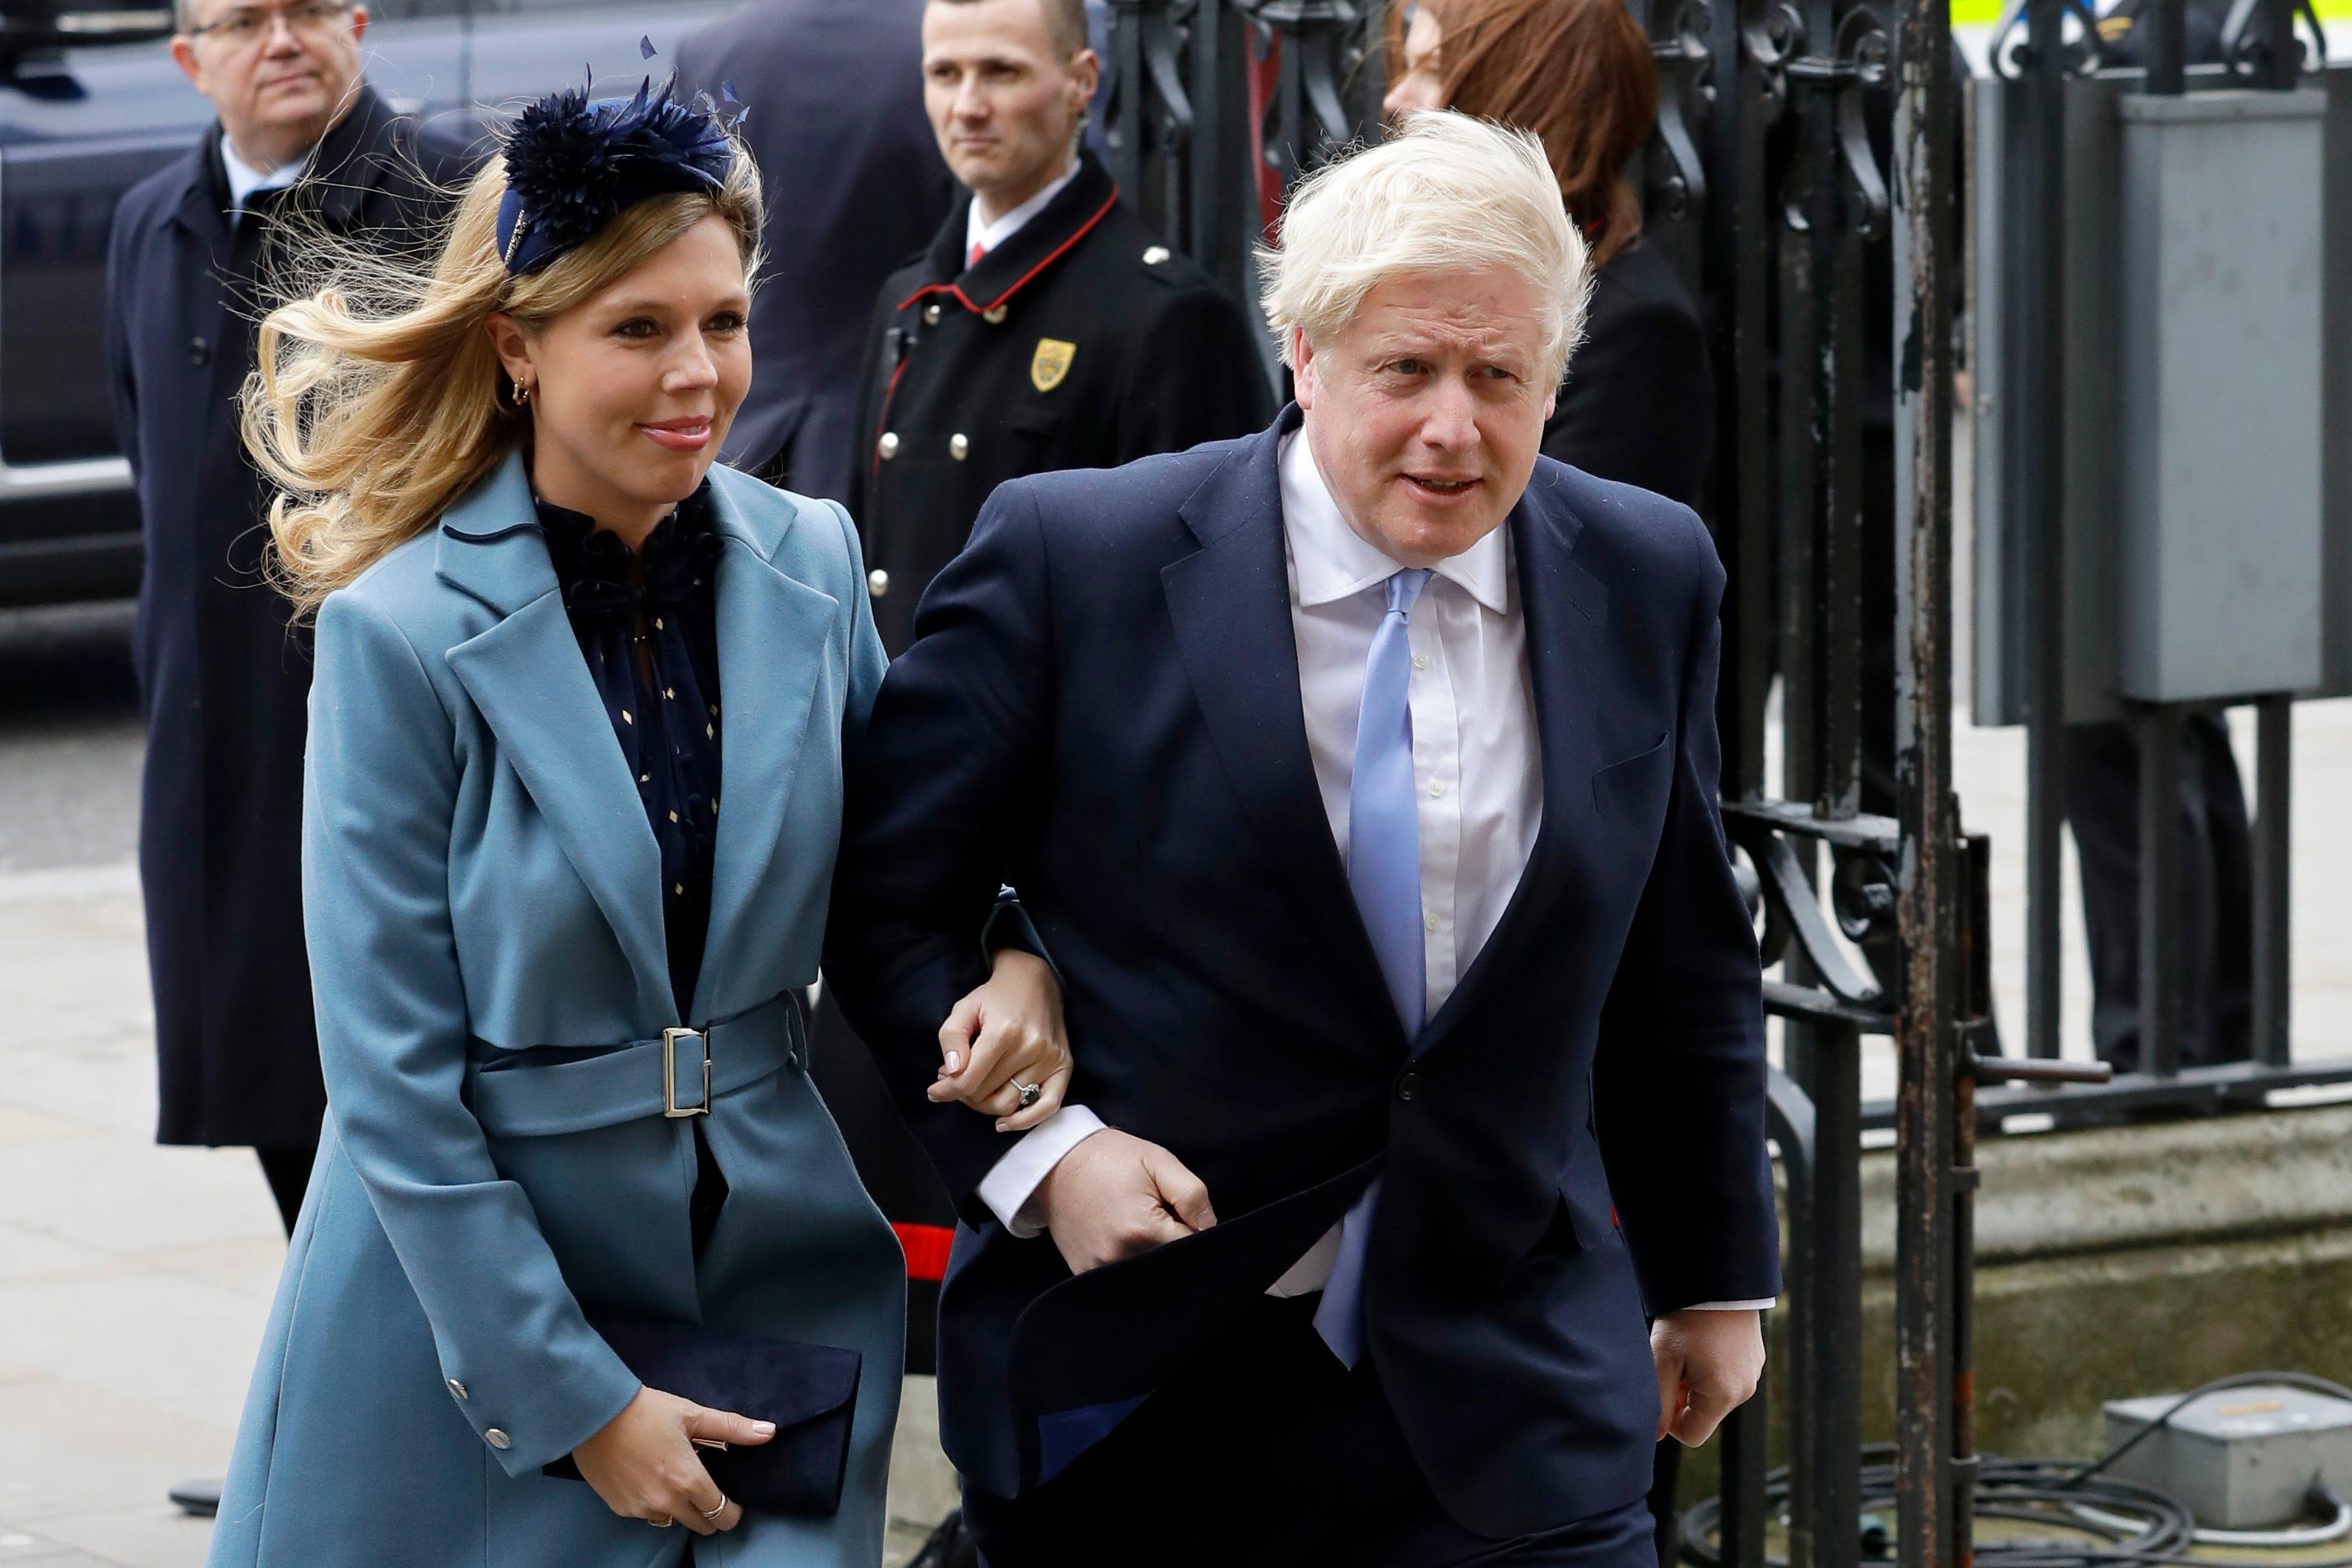 Reports: Boris Johnson, fiancée Carrie Symonds wed in London 2